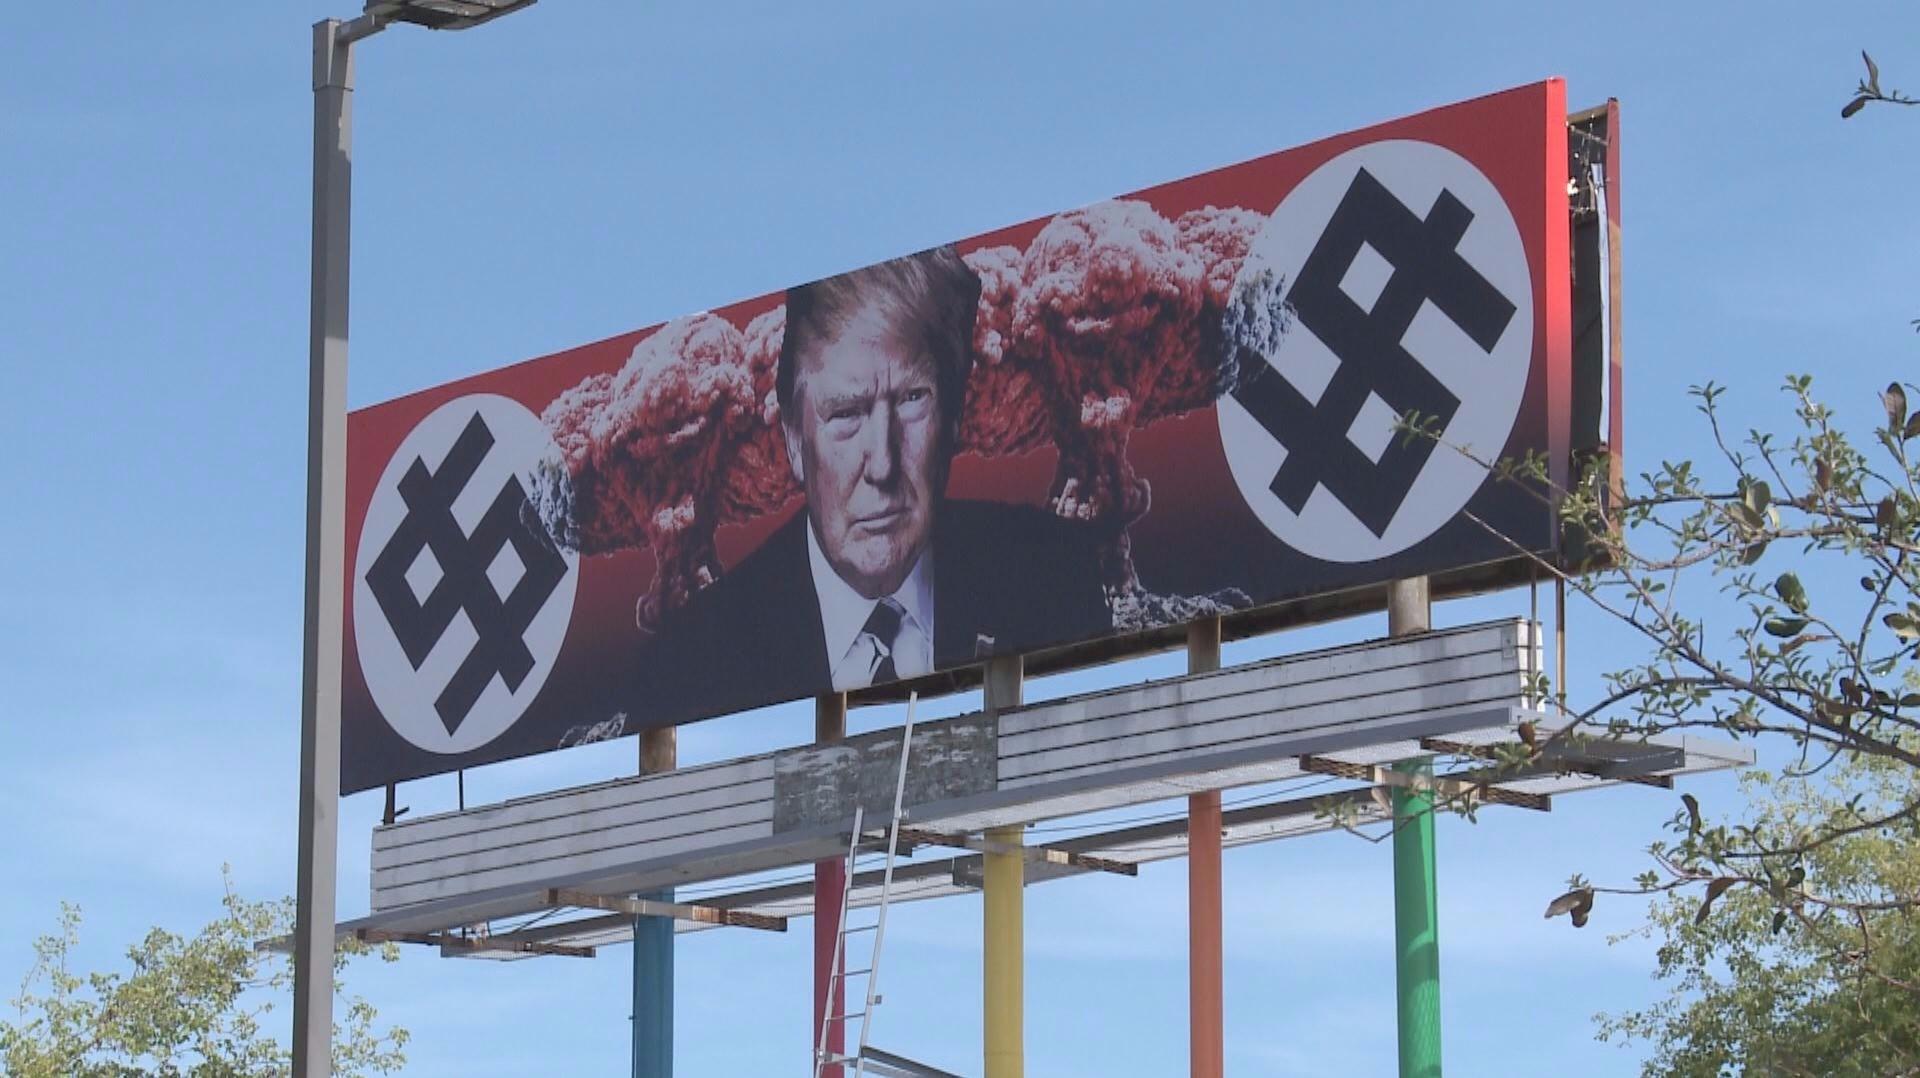 Owner of Phoenix Trump billboard: It will stay up as long as Trump is president